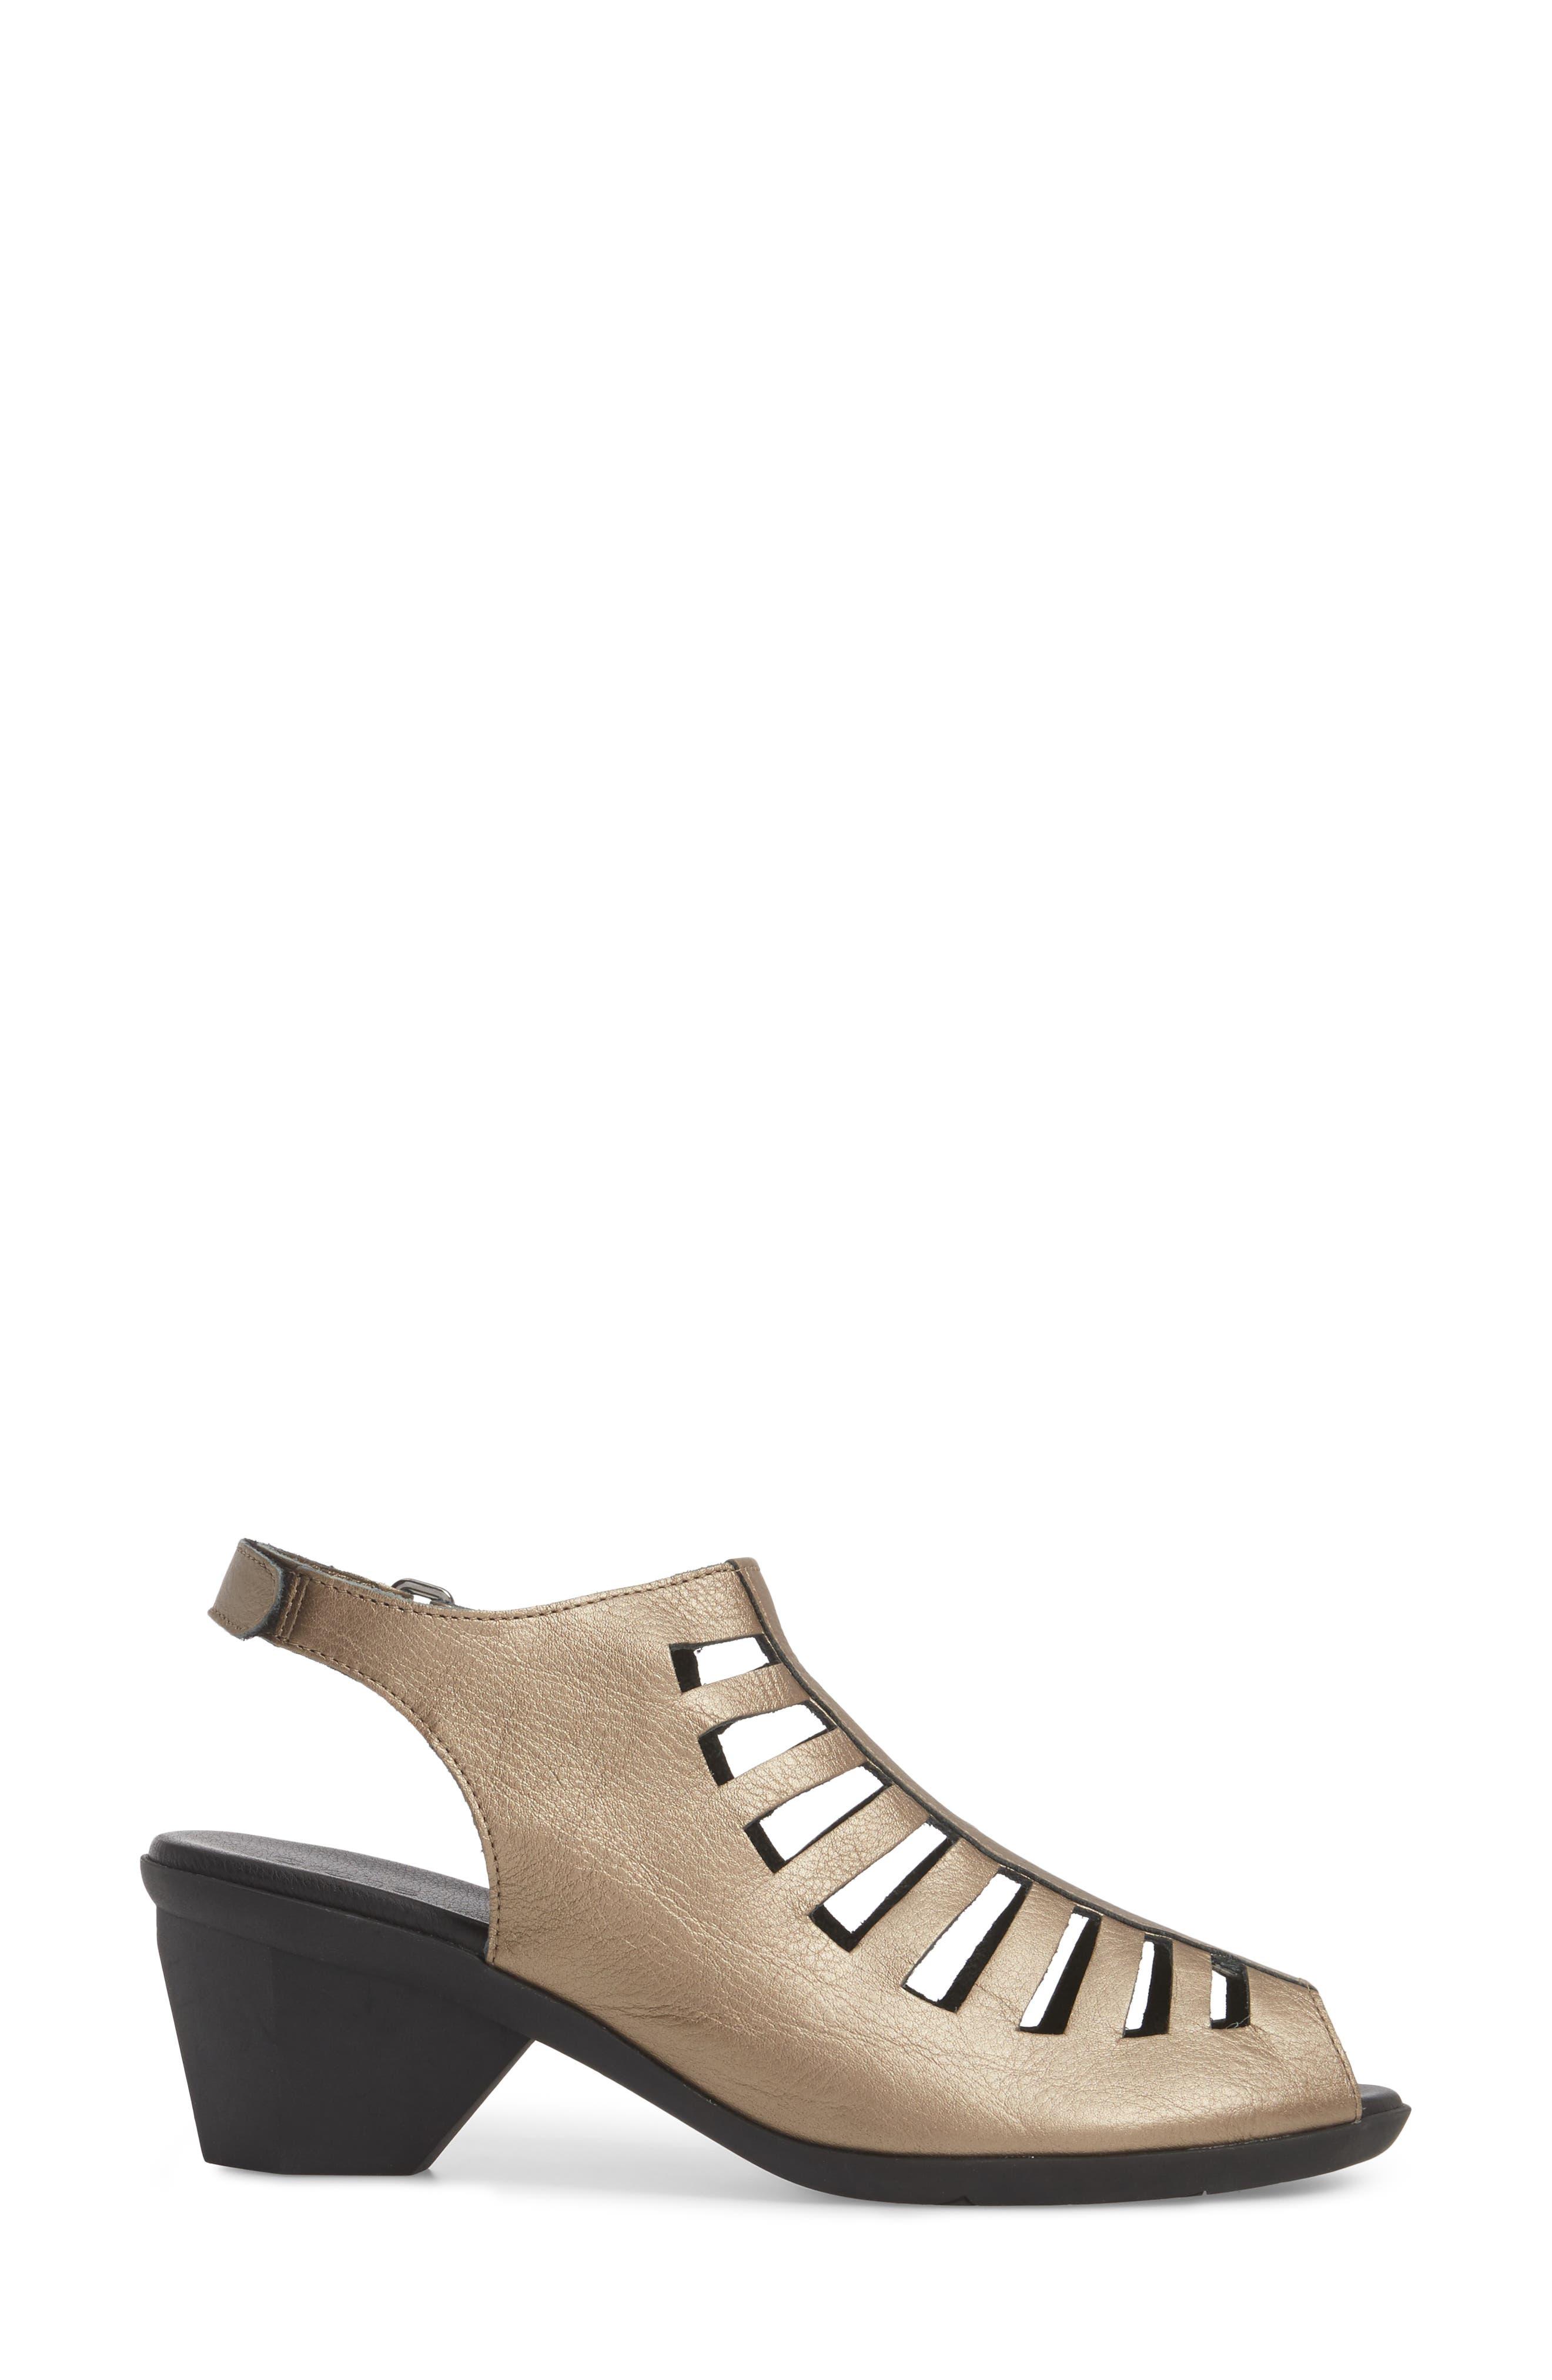 Enexor Sandal,                             Alternate thumbnail 3, color,                             Moon/ Noir Leather